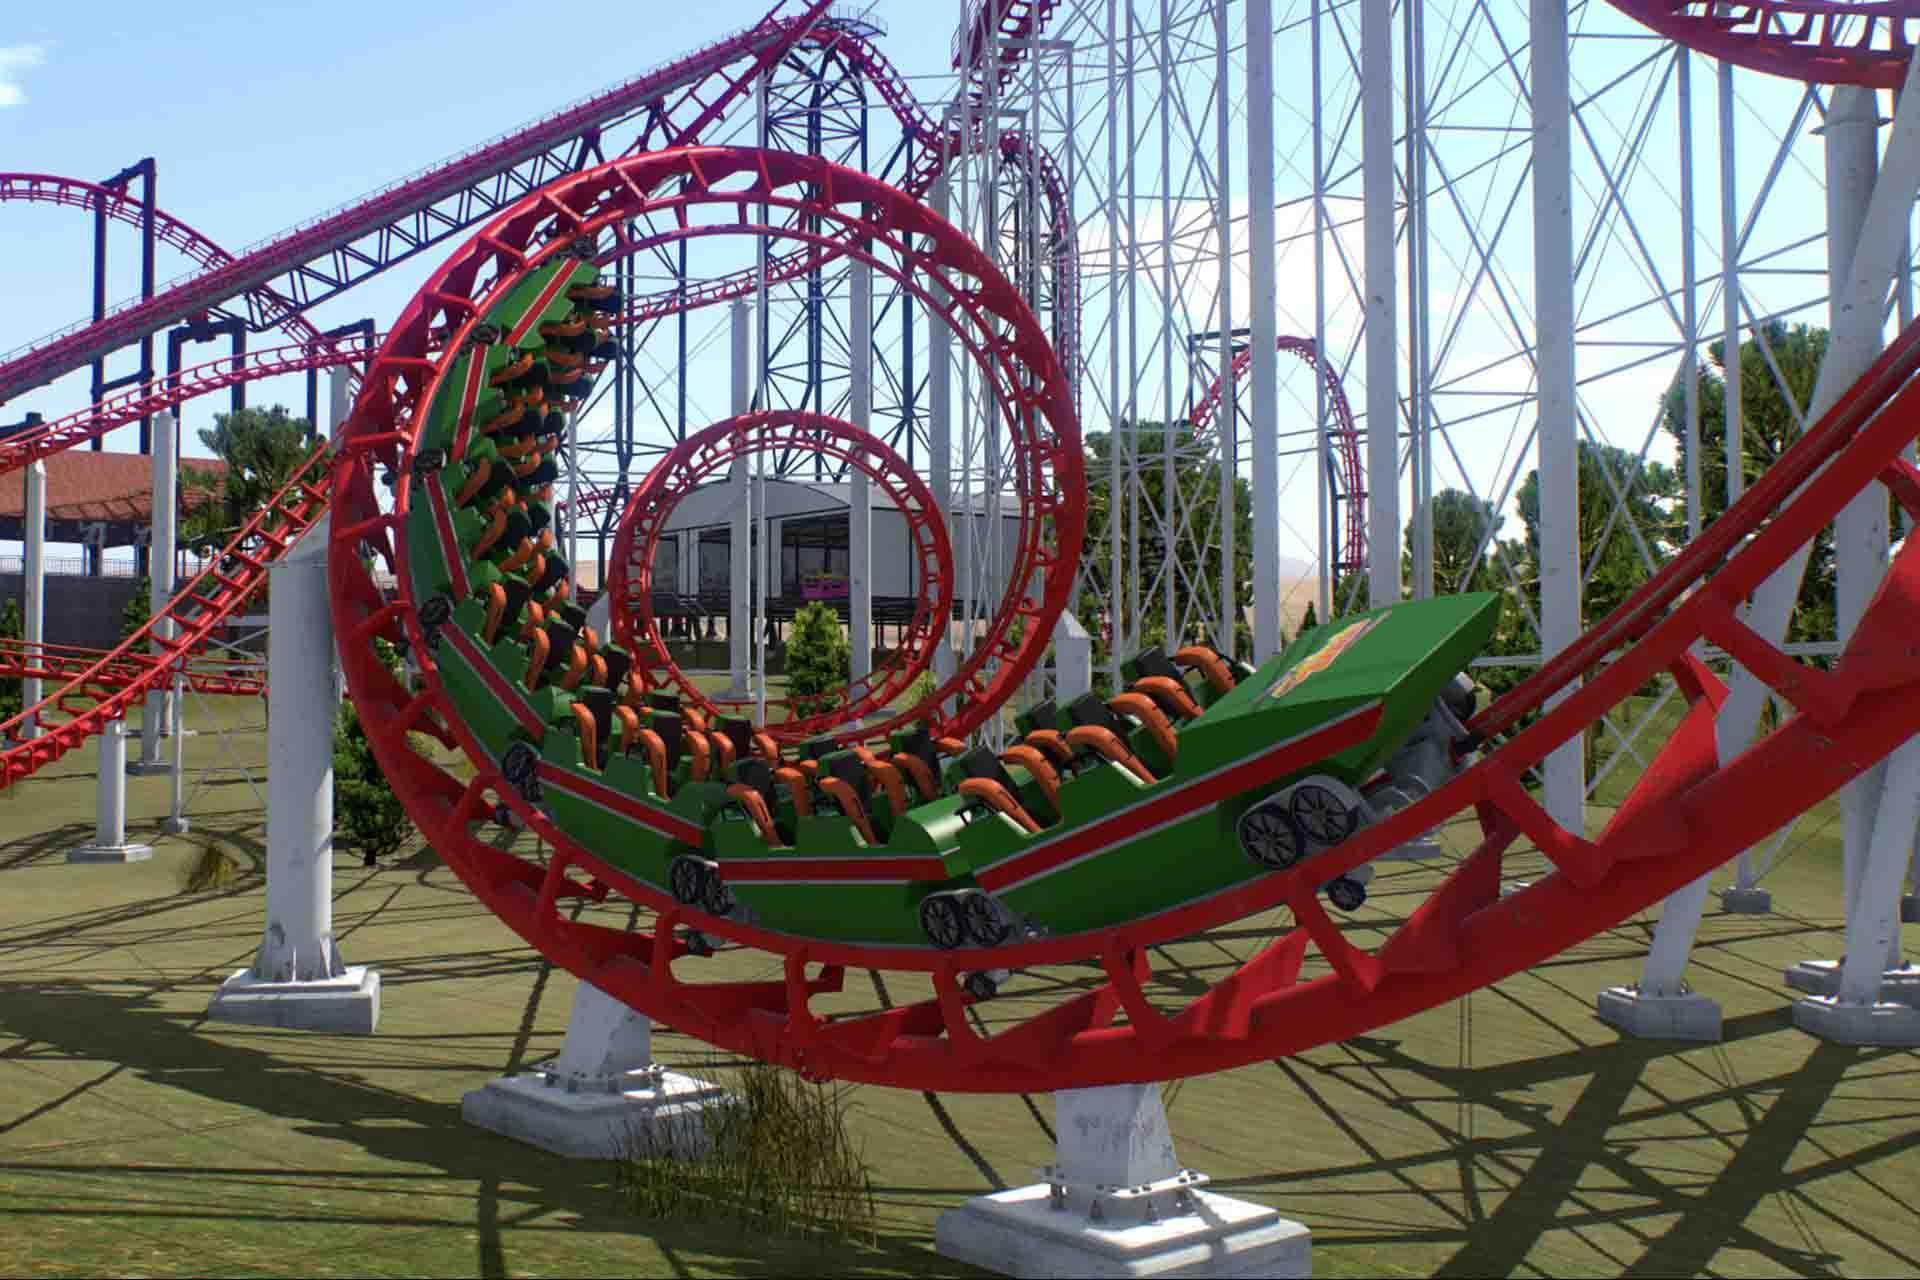 Symulator rollercoastera VR Cybermagia